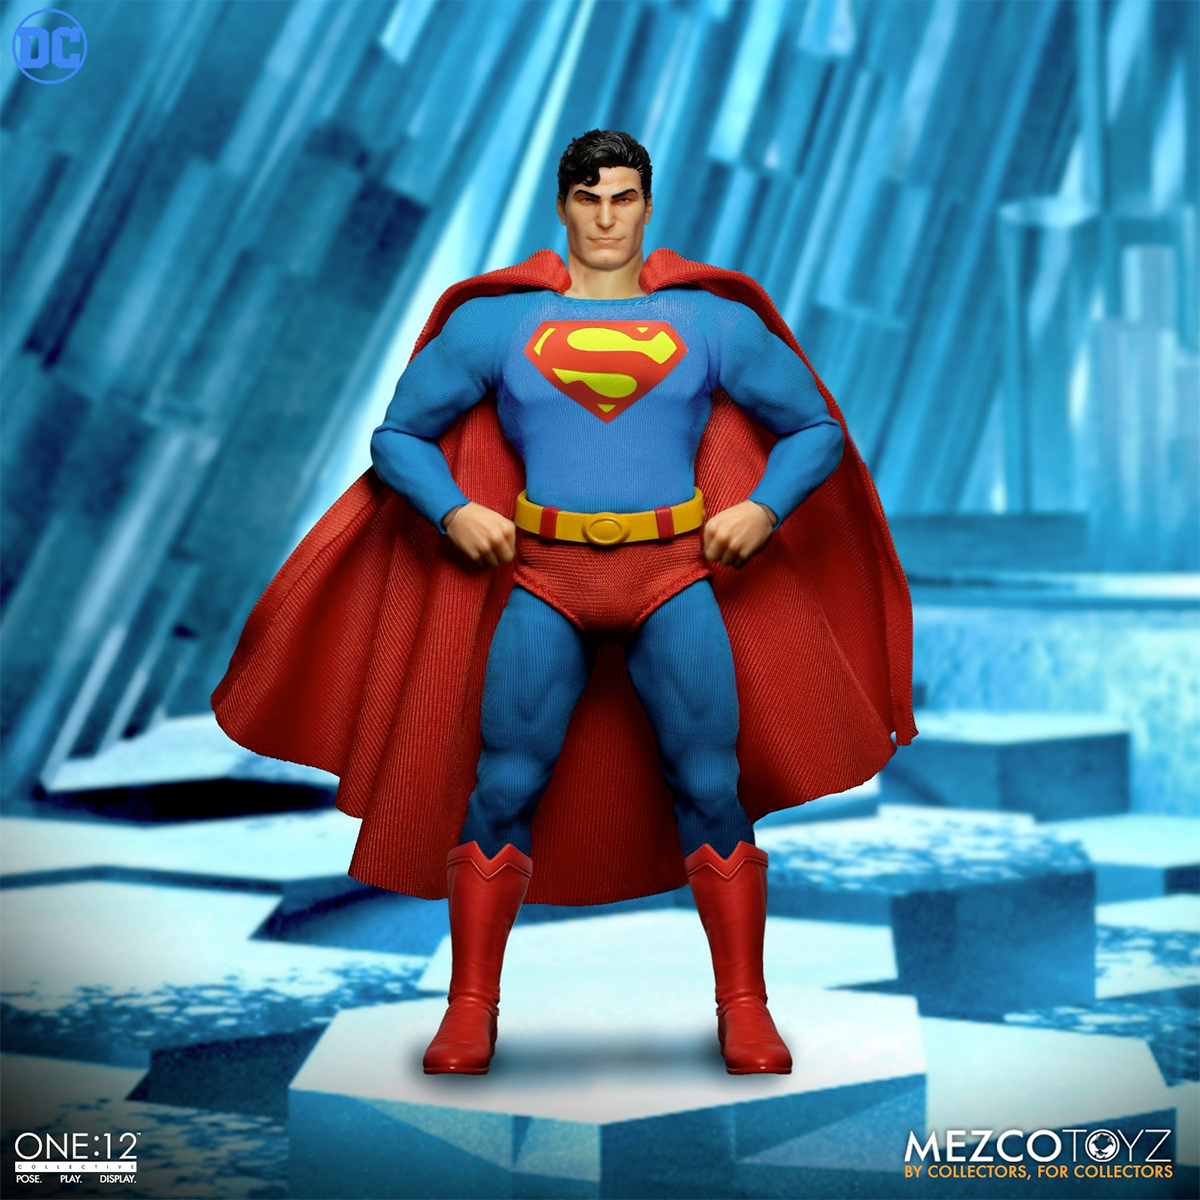 Action Figure Superman - Man of Steel One:12 Collective da Mezco Toyz